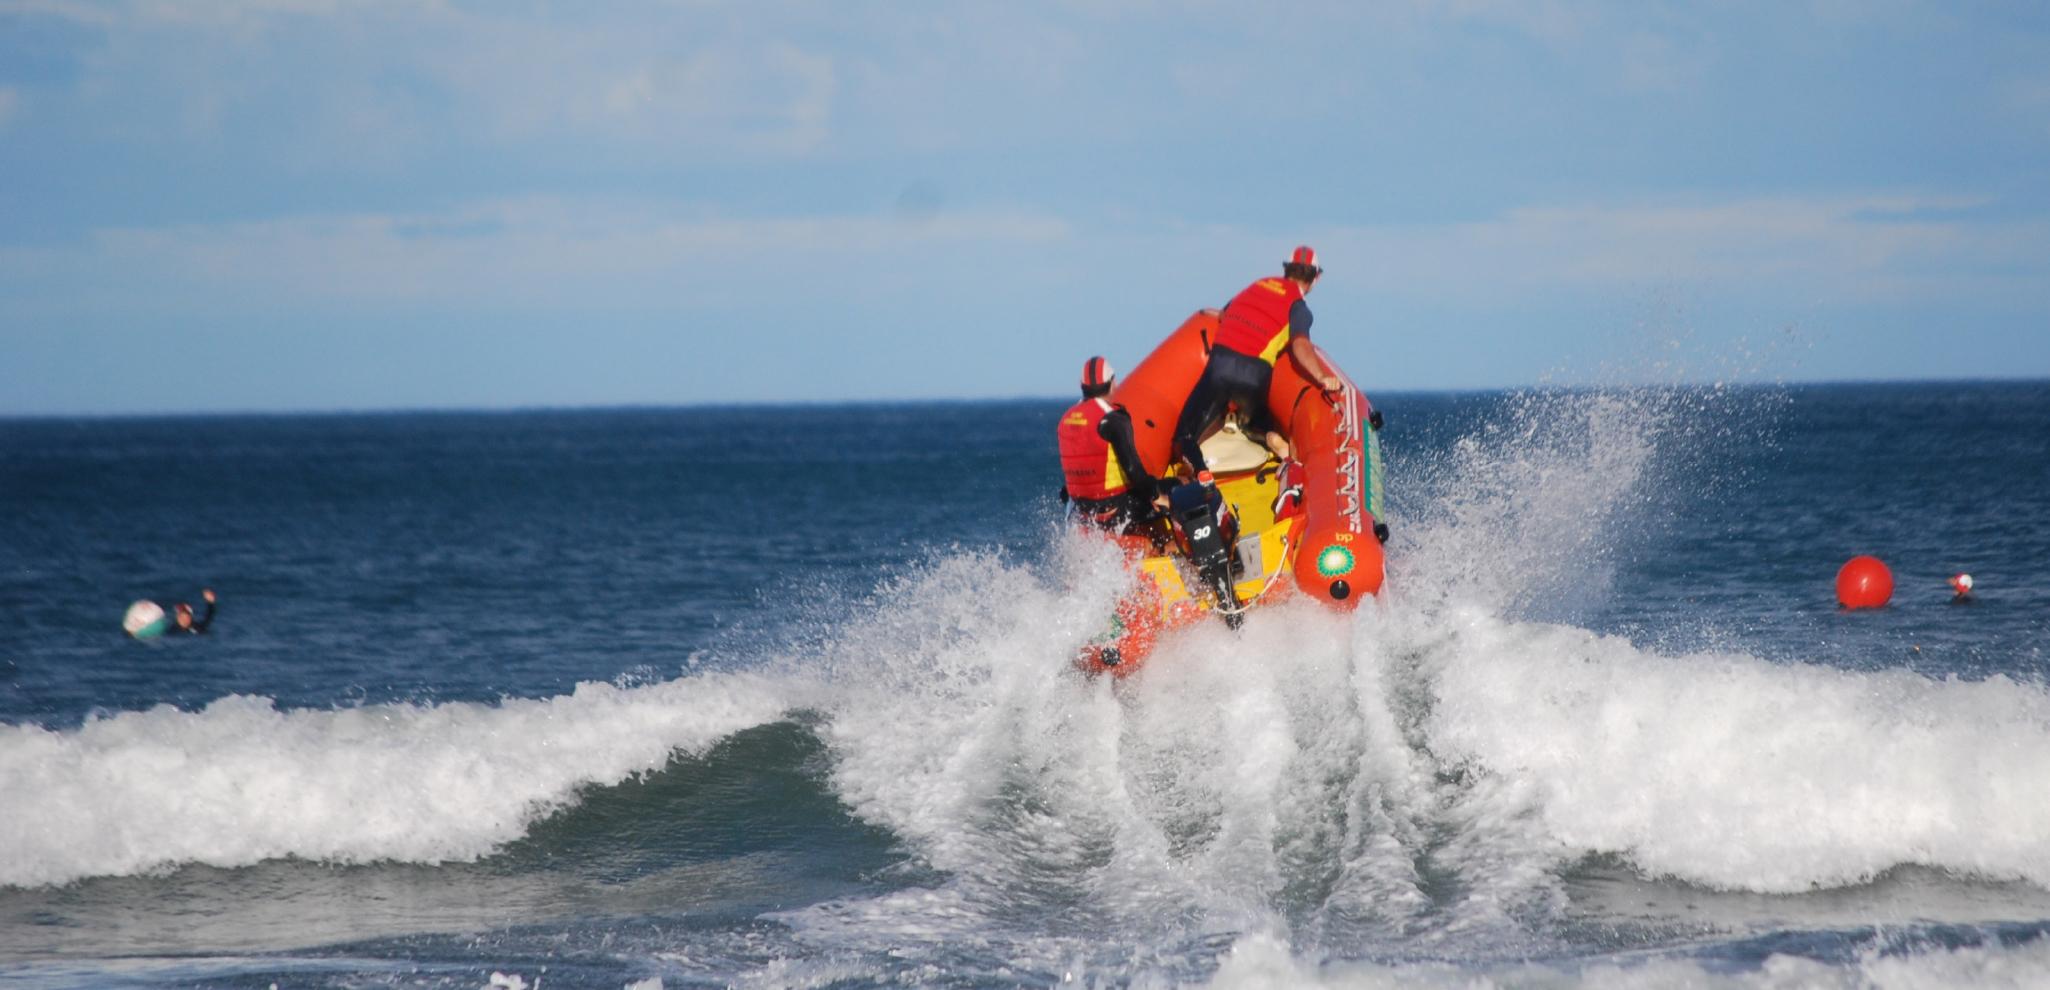 Waimarama Suft Life Saving Club